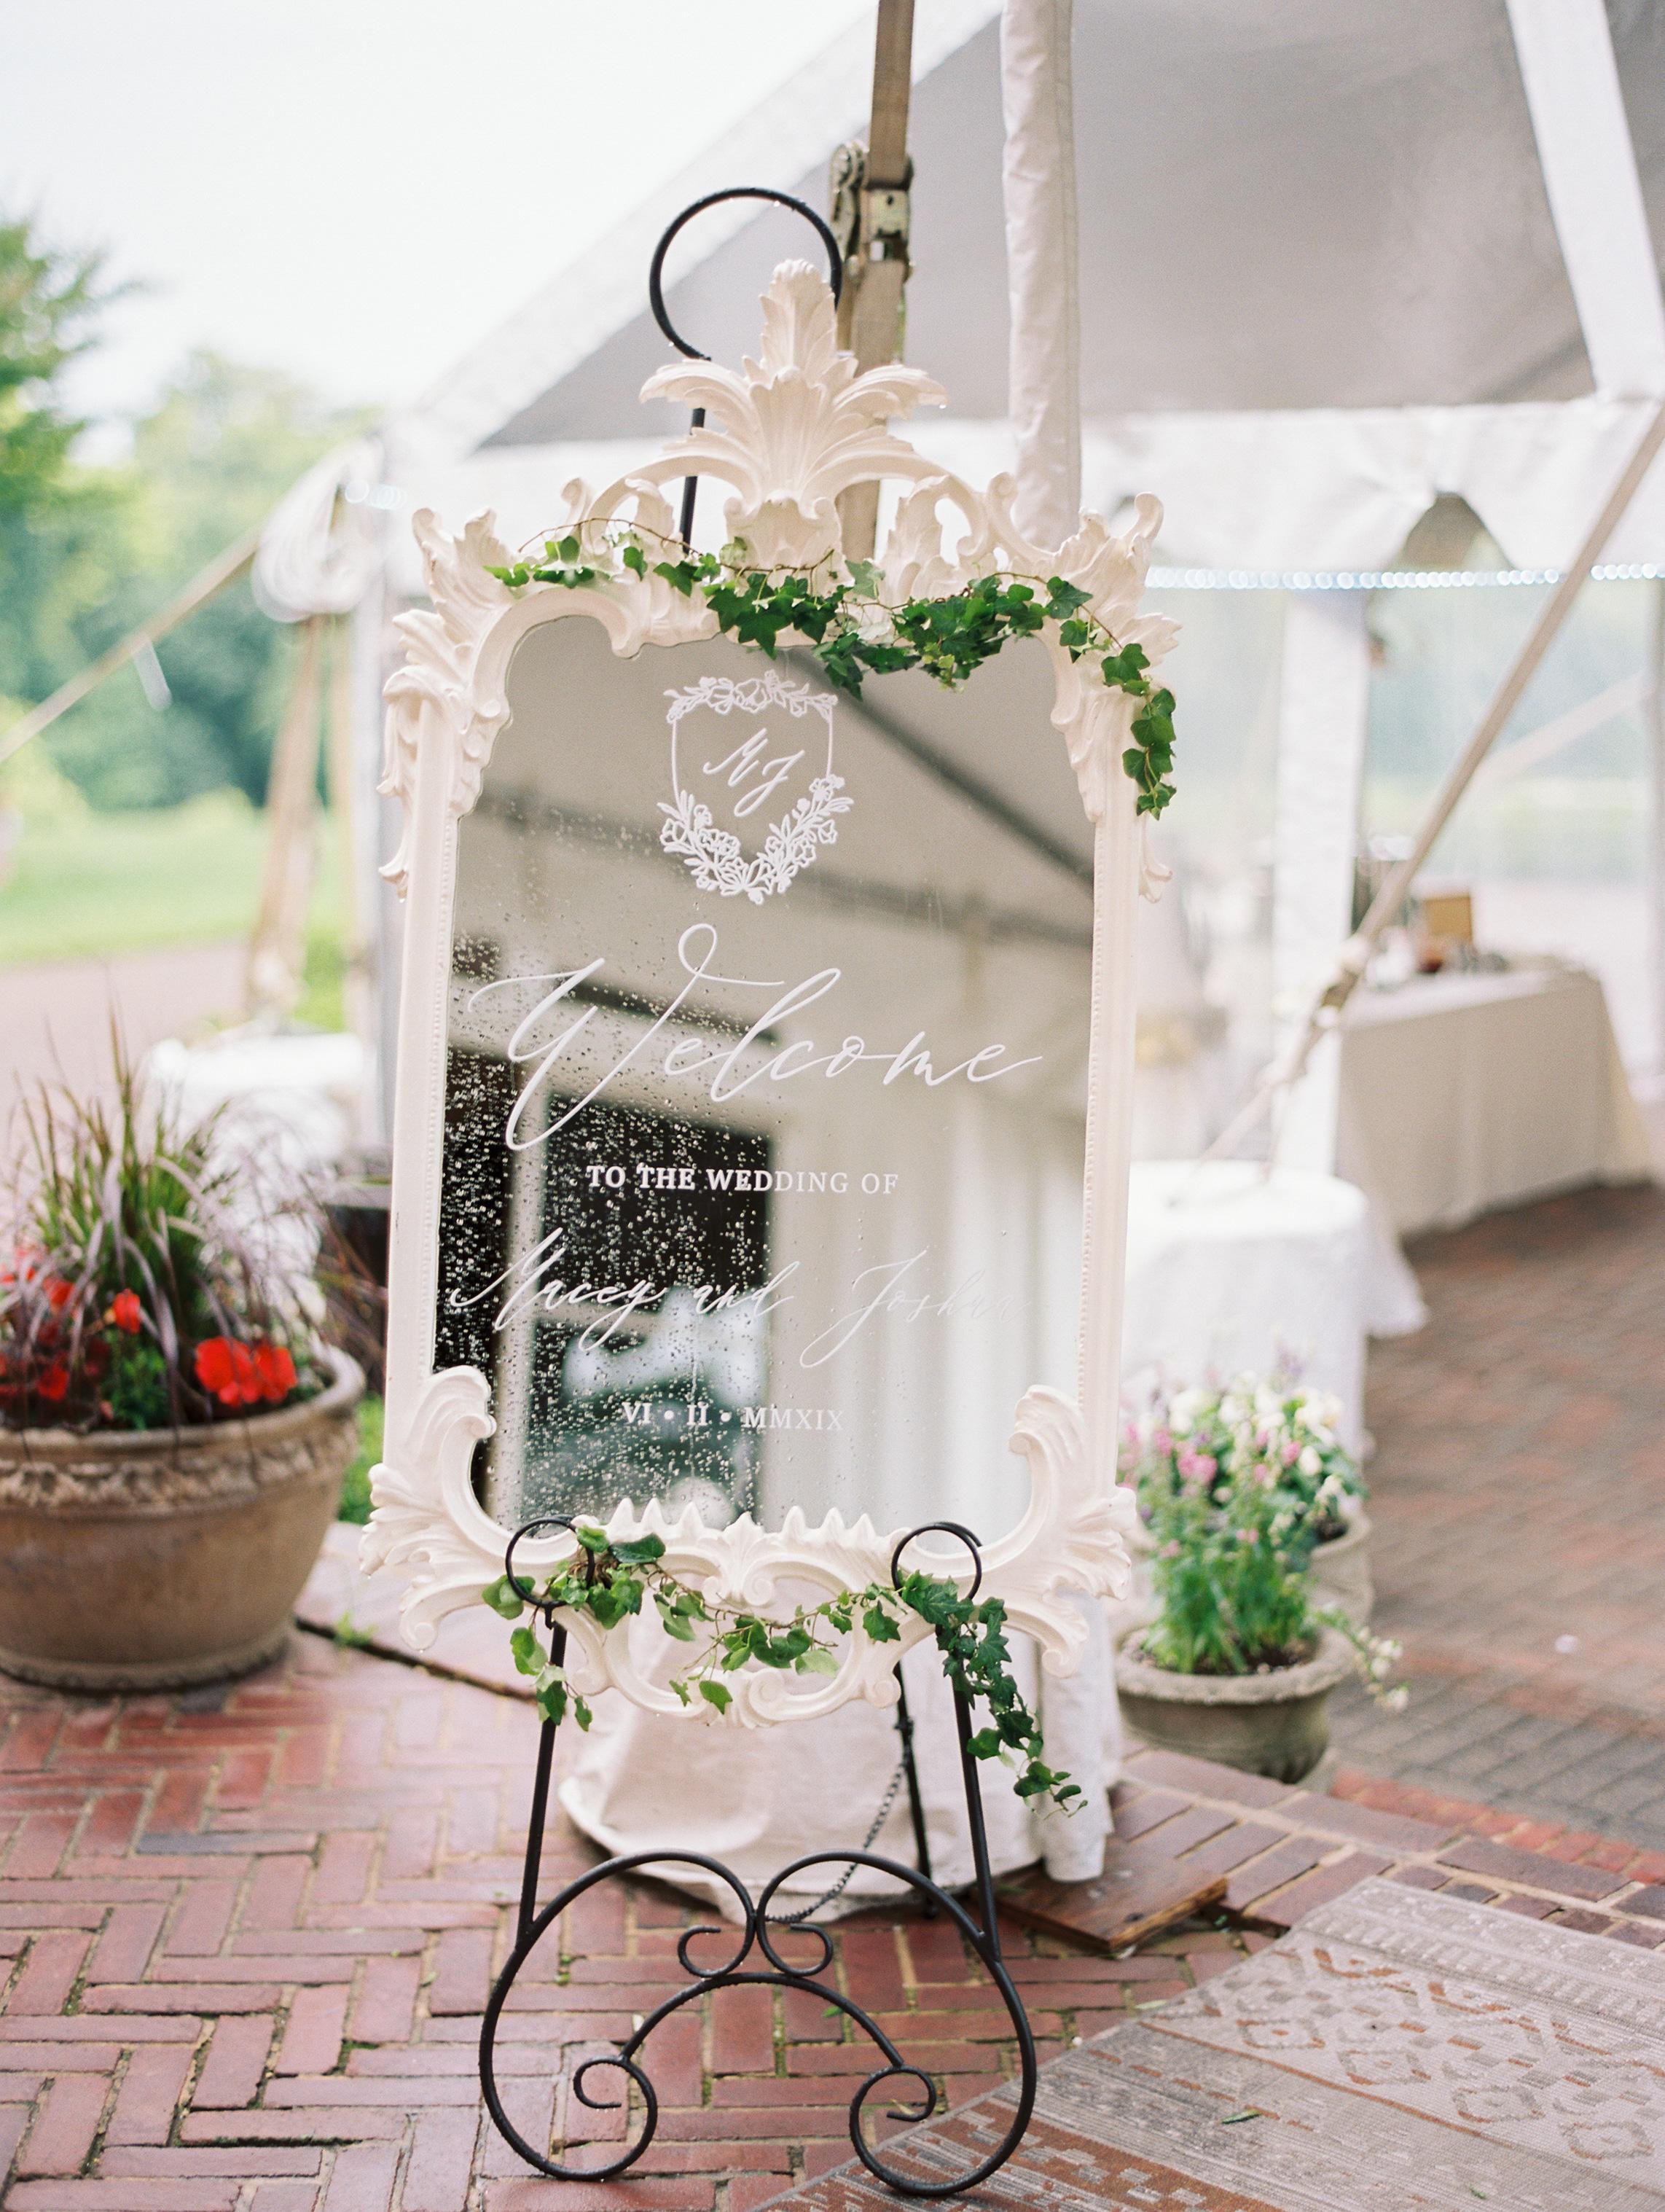 macey joshua wedding reception welcome sign